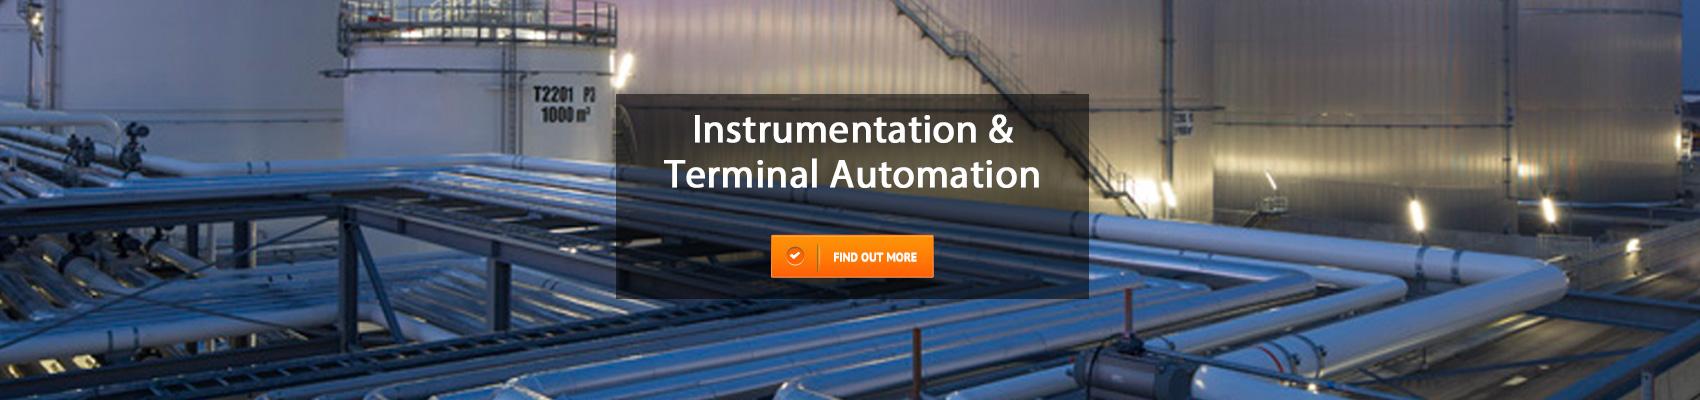 slides-Instrumentation-&-Terminal-Automation